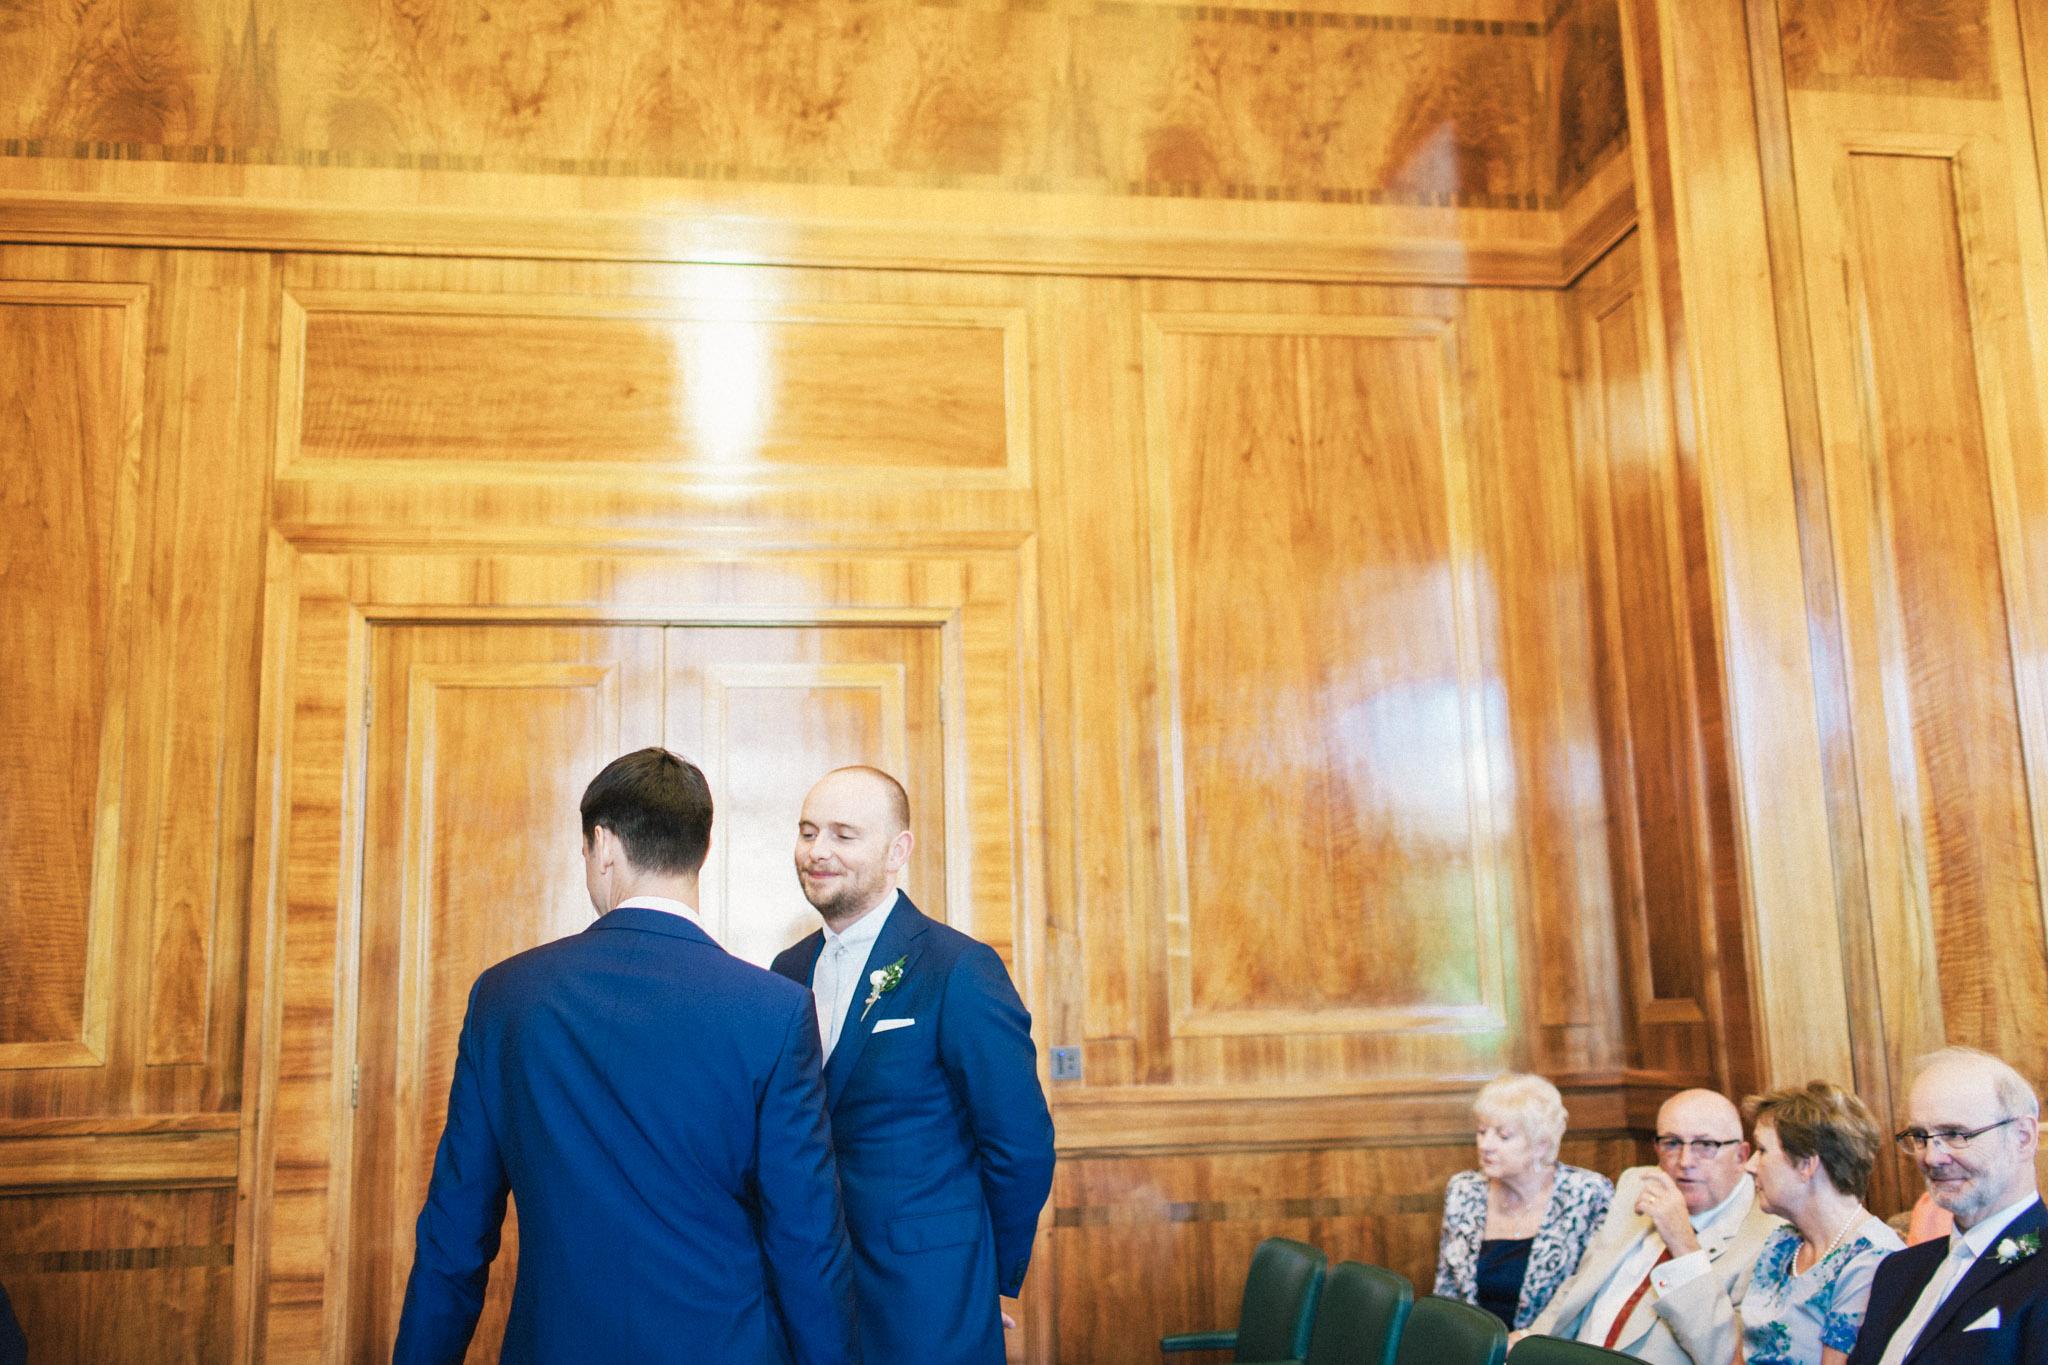 trinity_buoy_wharf_hackney_town_hall_wedding_370.jpg